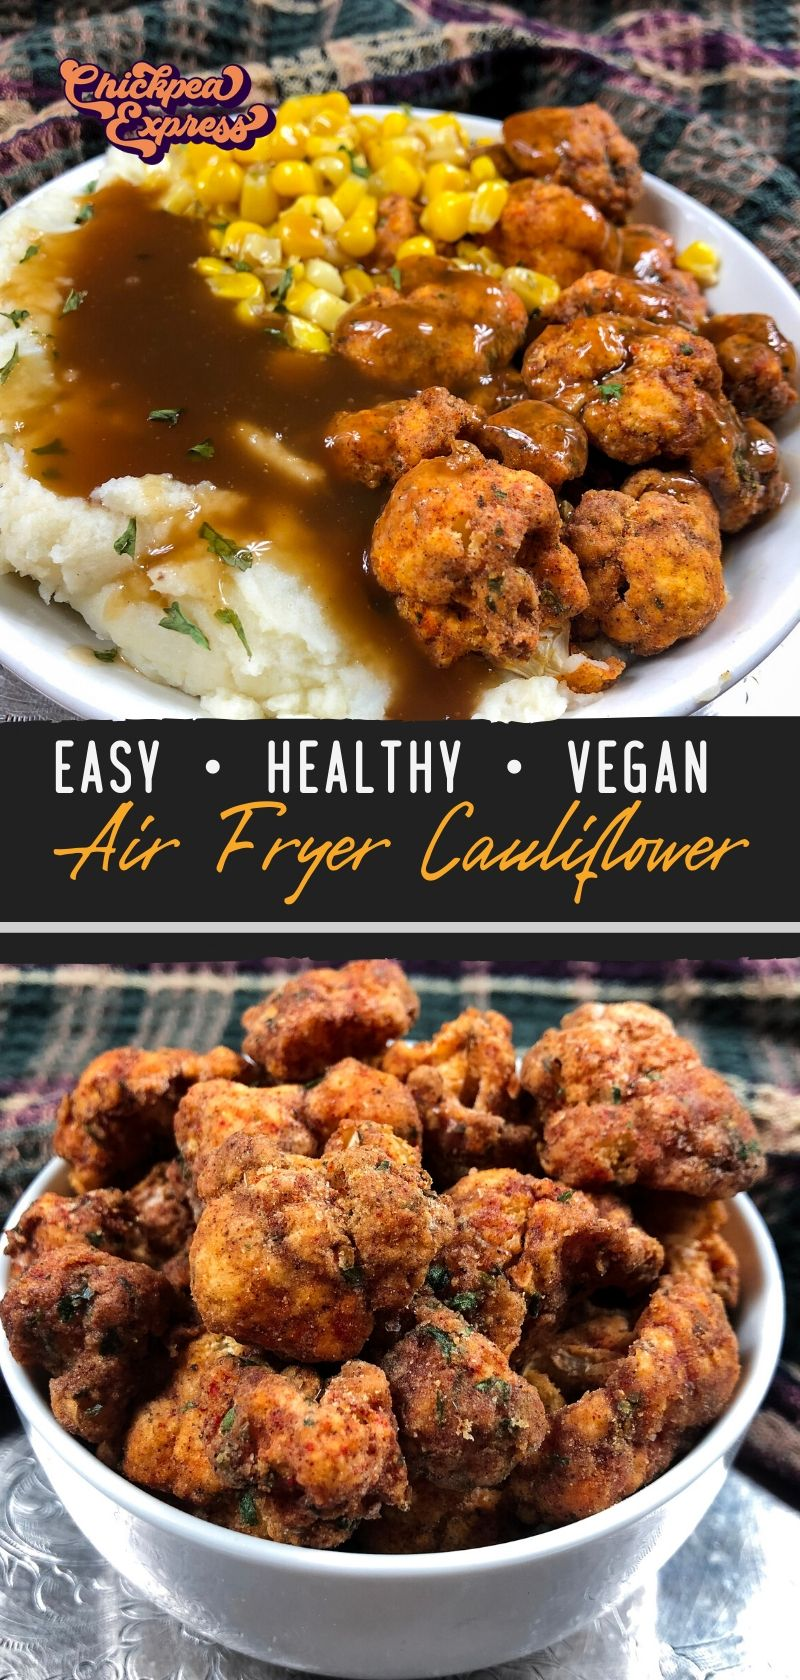 Vegan Air Fryer Cauliflower Recipe Air fryer recipes